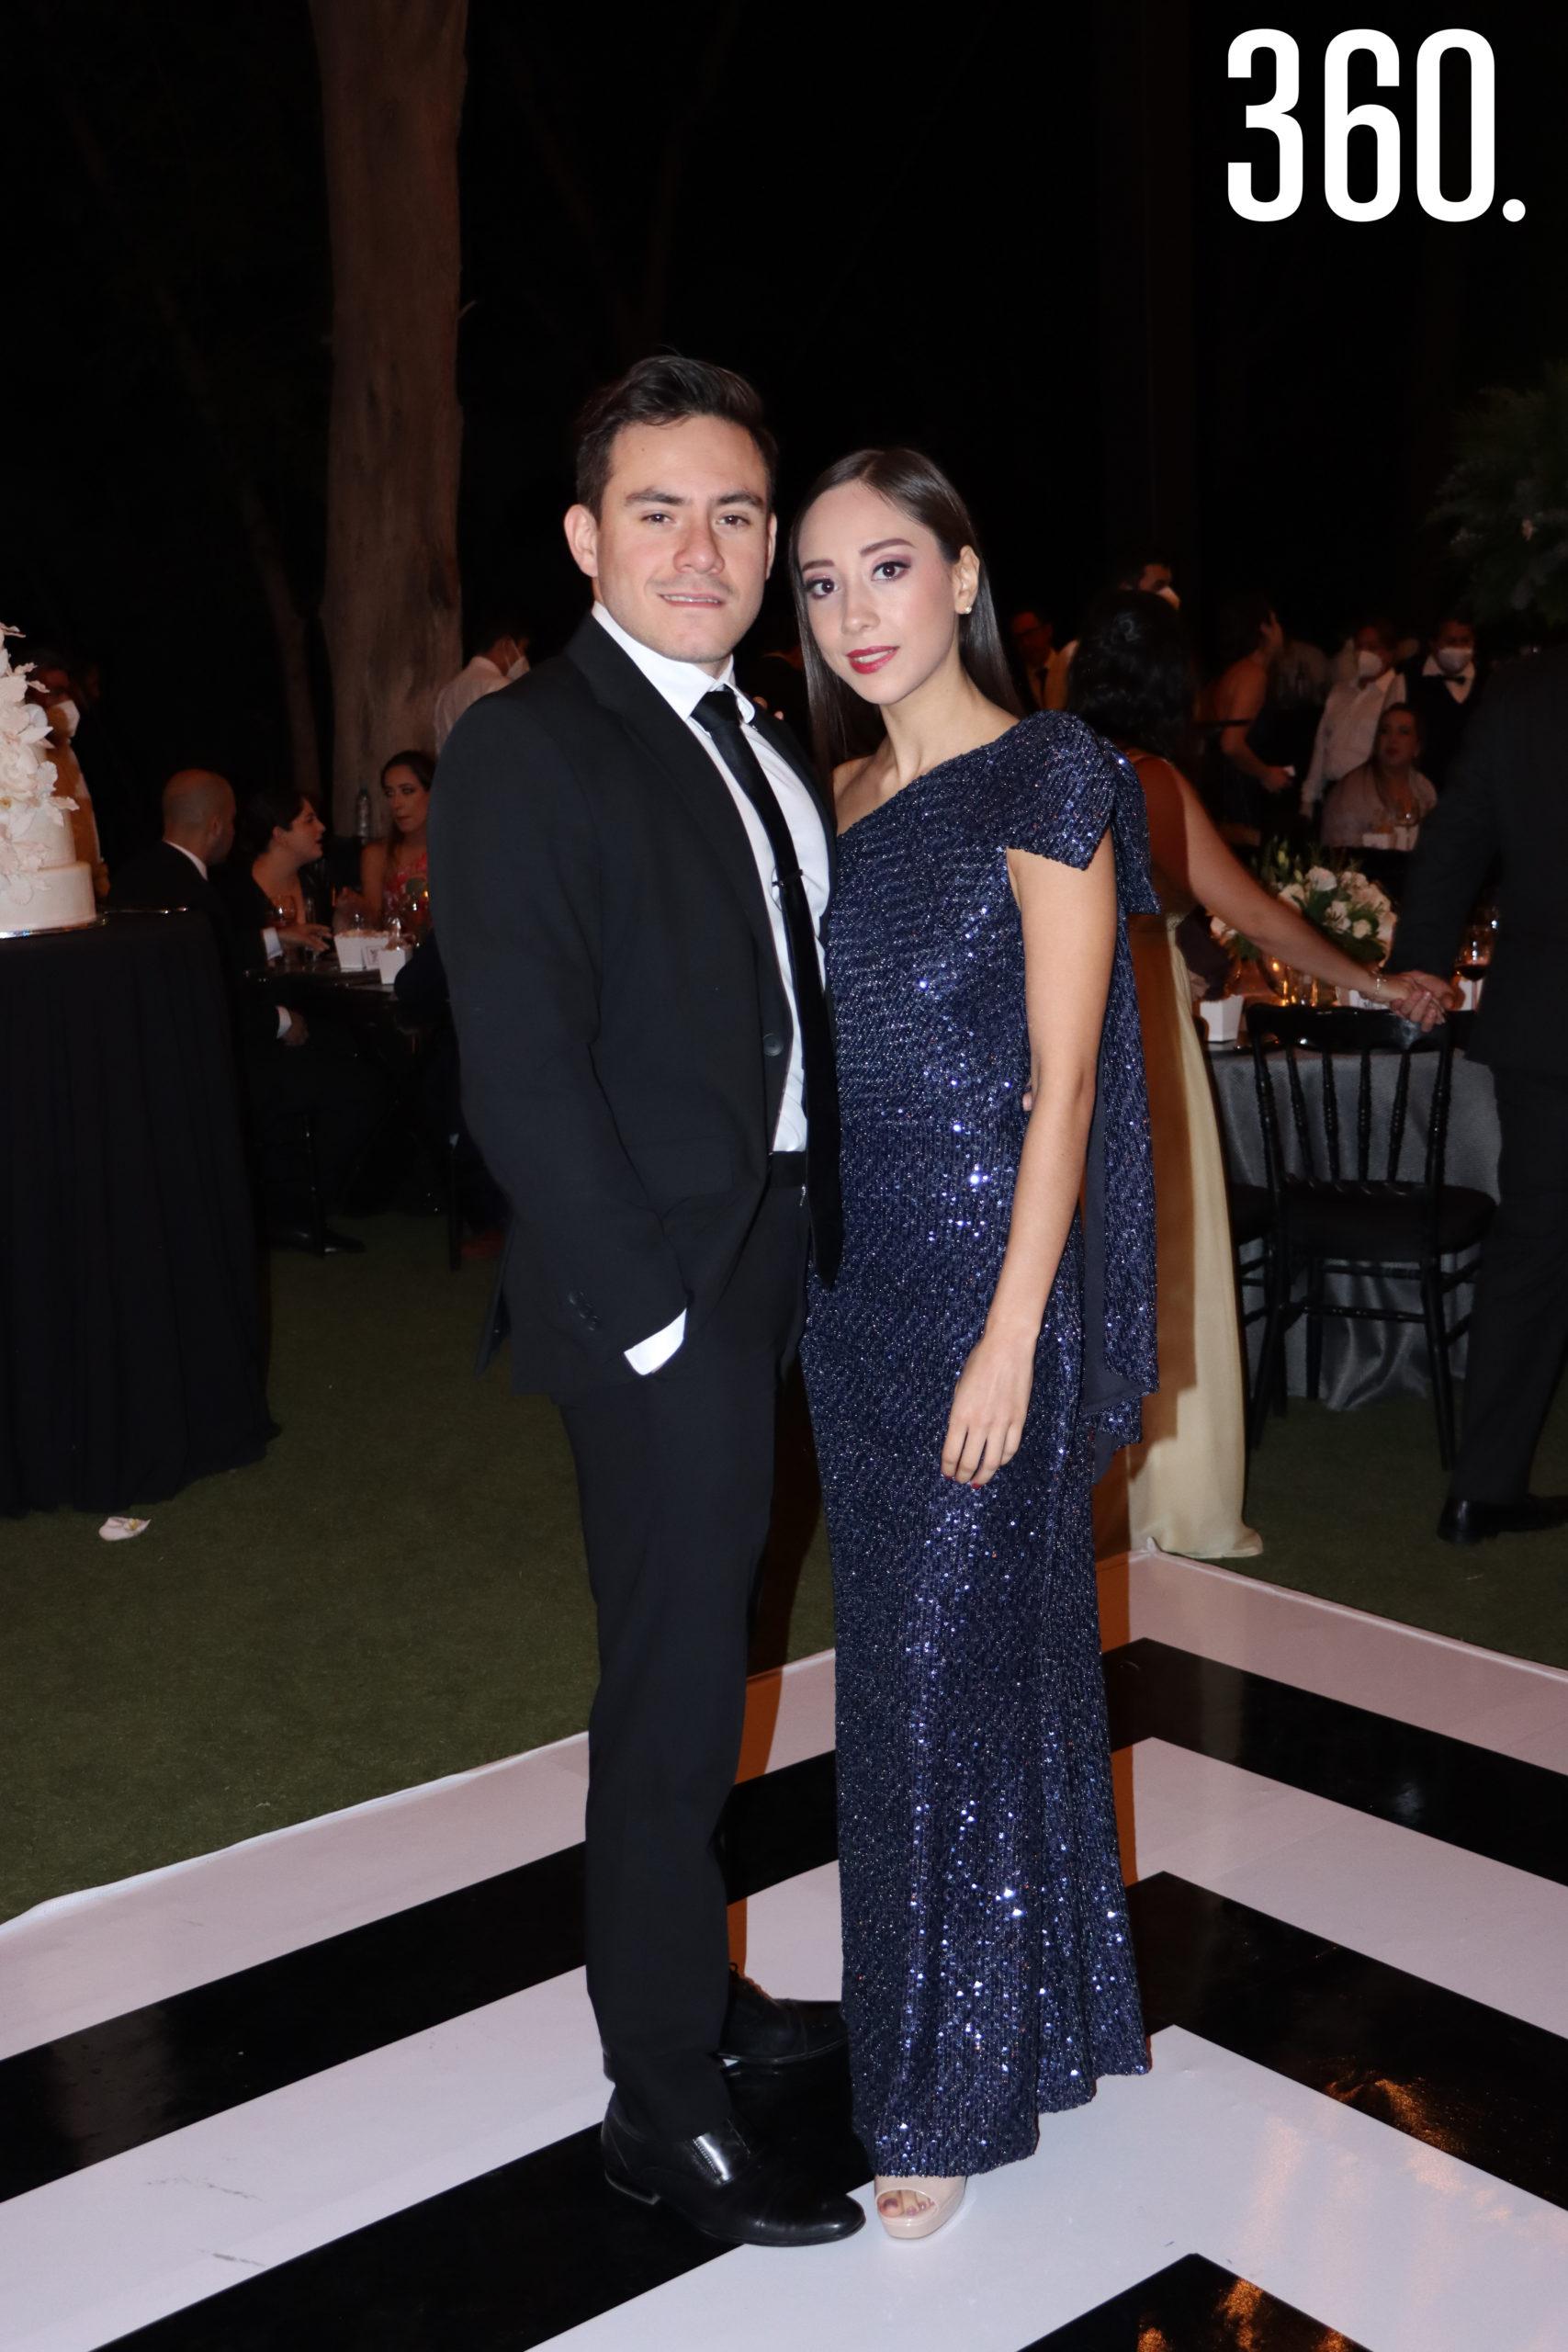 David Treviño y Kassandra Barrera.